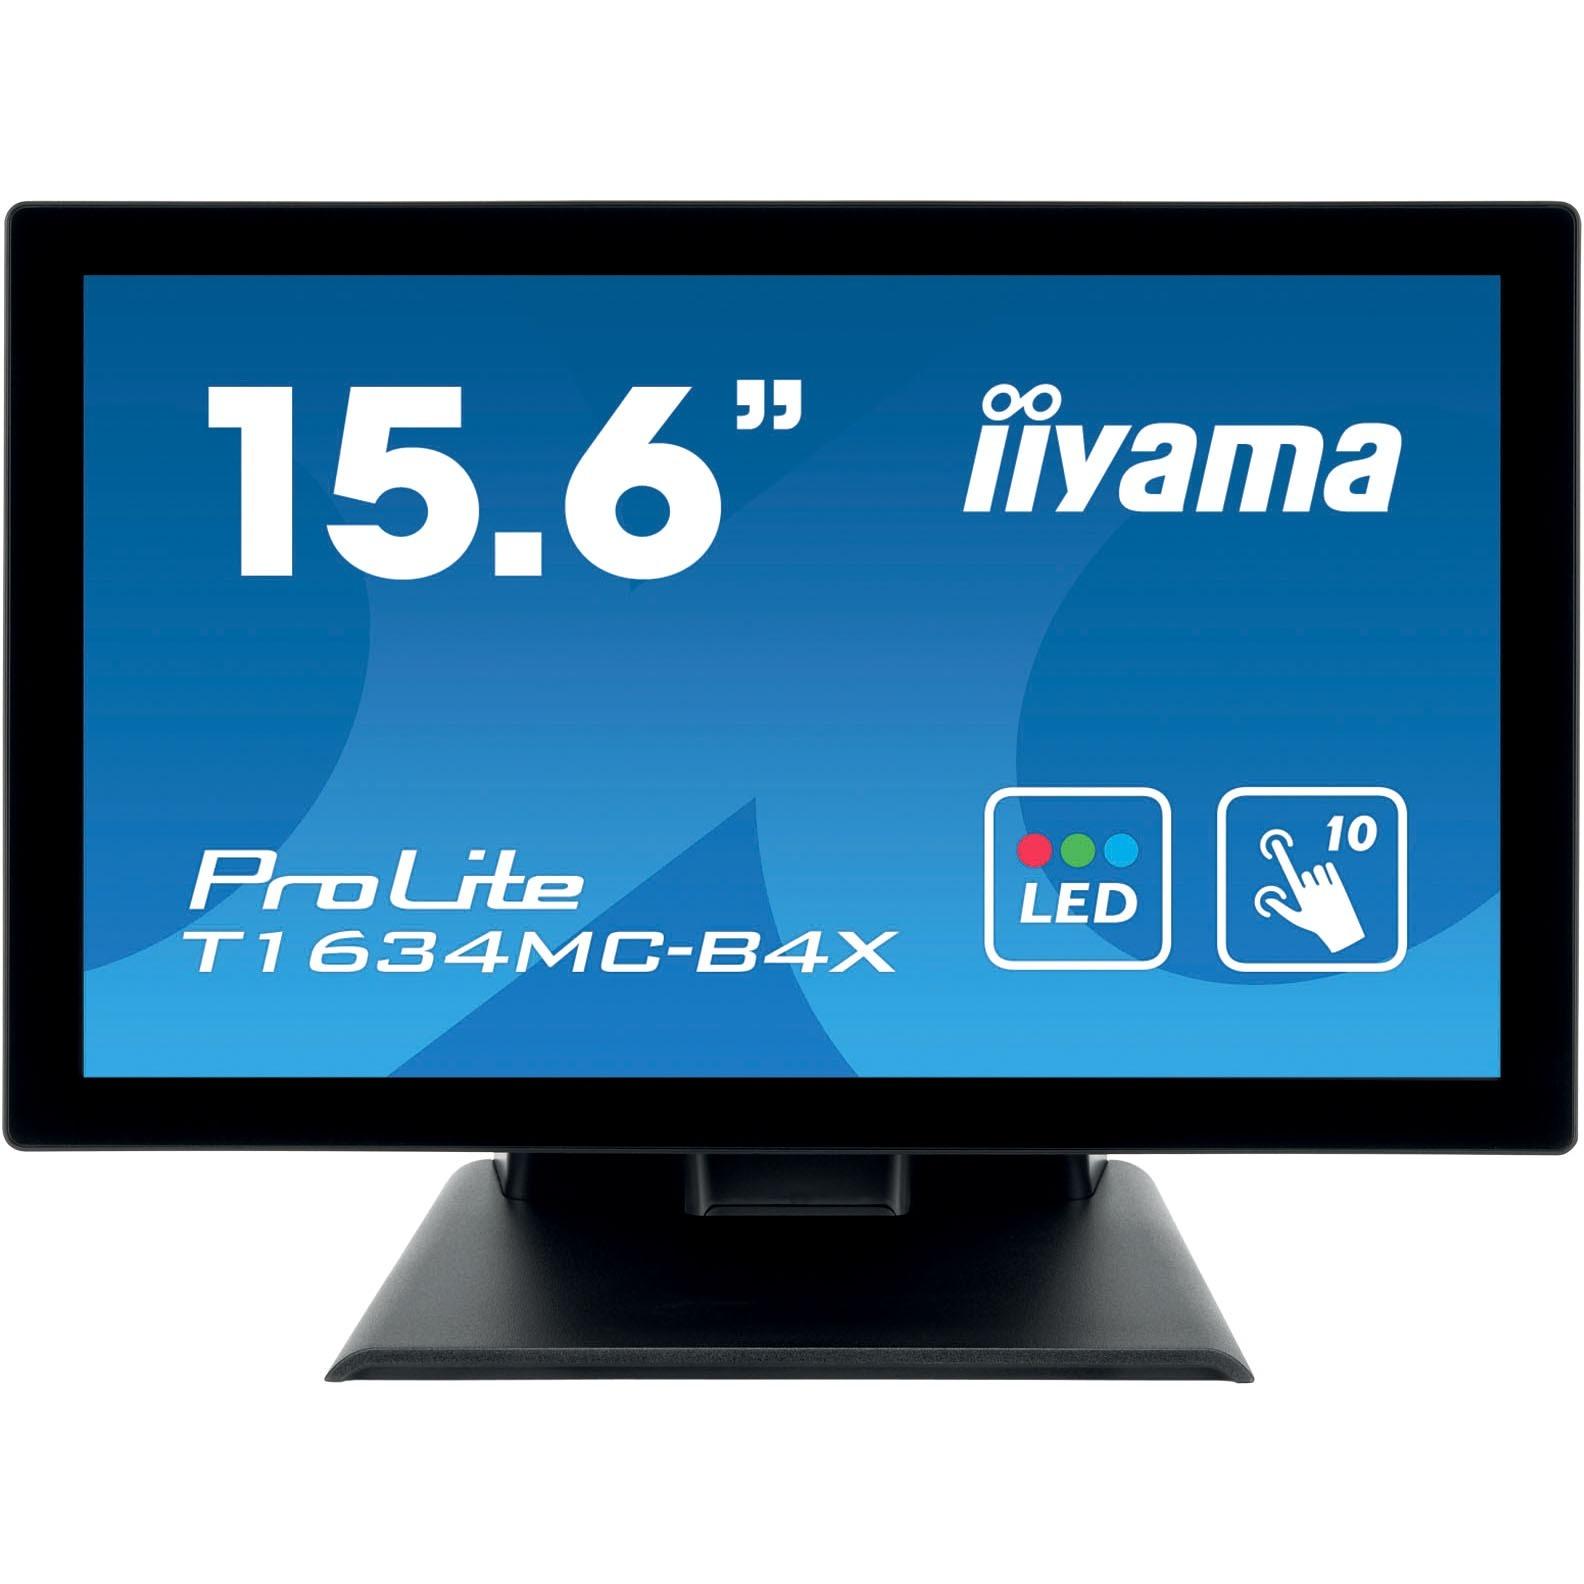 iiyama ProLite T1634MC-B4X 39.6 cm 15.6inch LCD Touchscreen Monitor - 16:9 - 8 ms